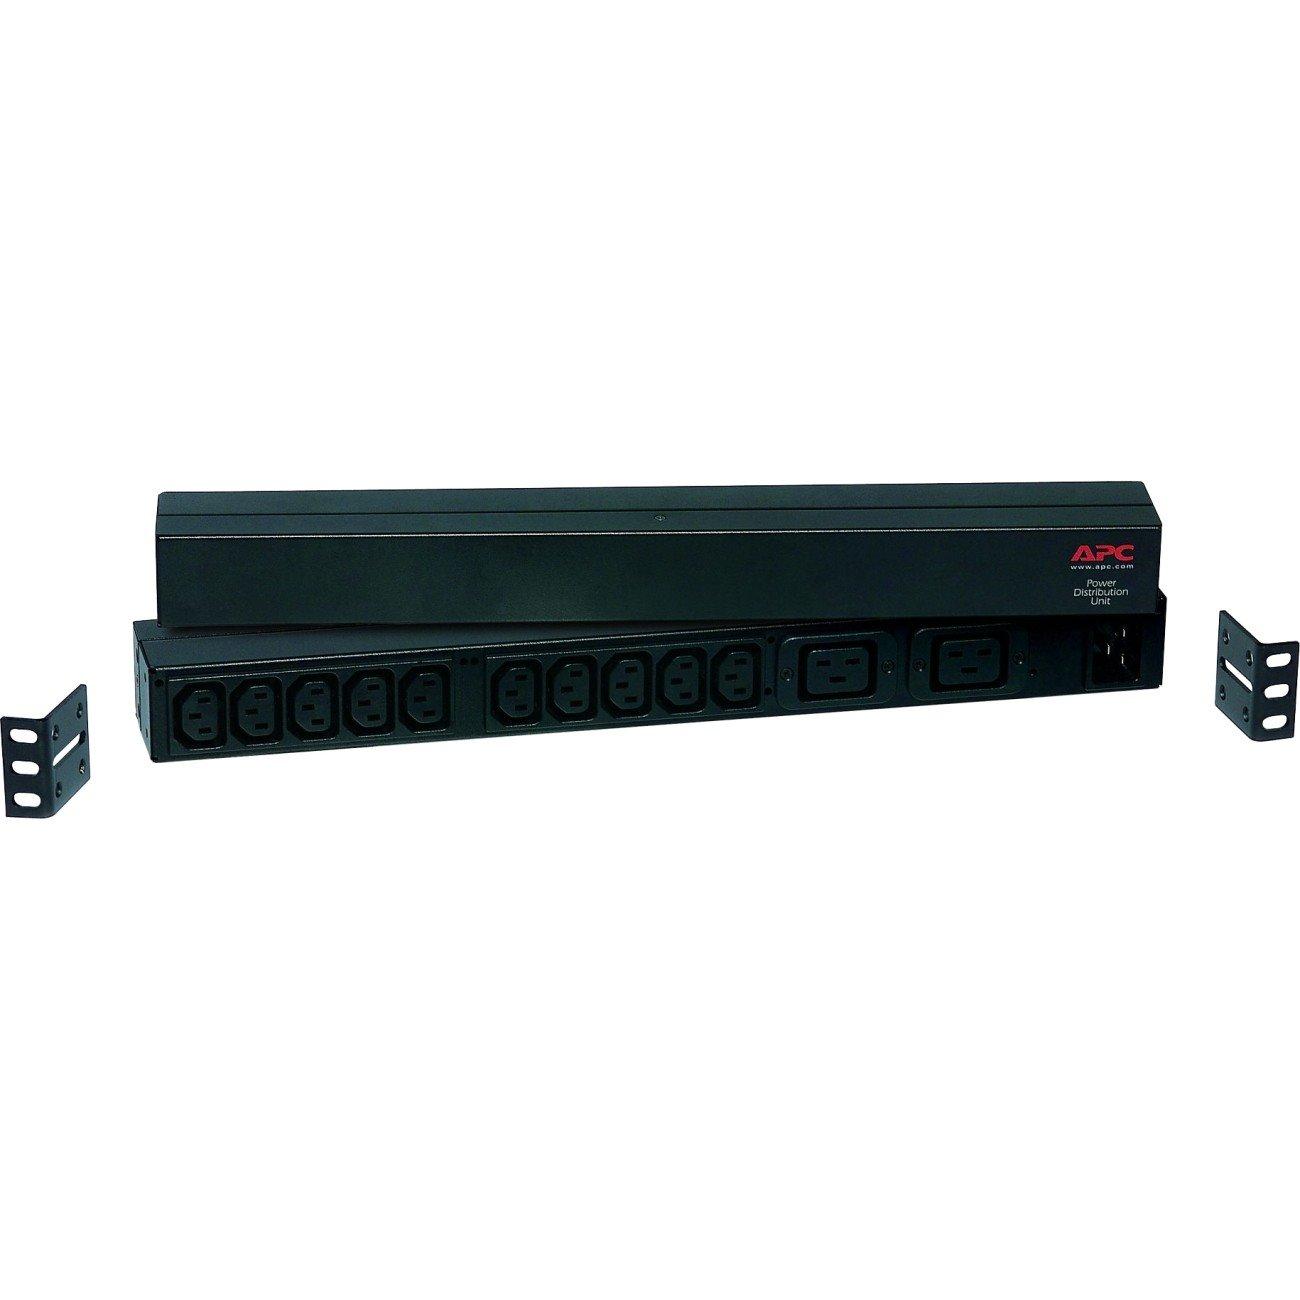 APC by Schneider Electric Basic Rack AP9559 PDU